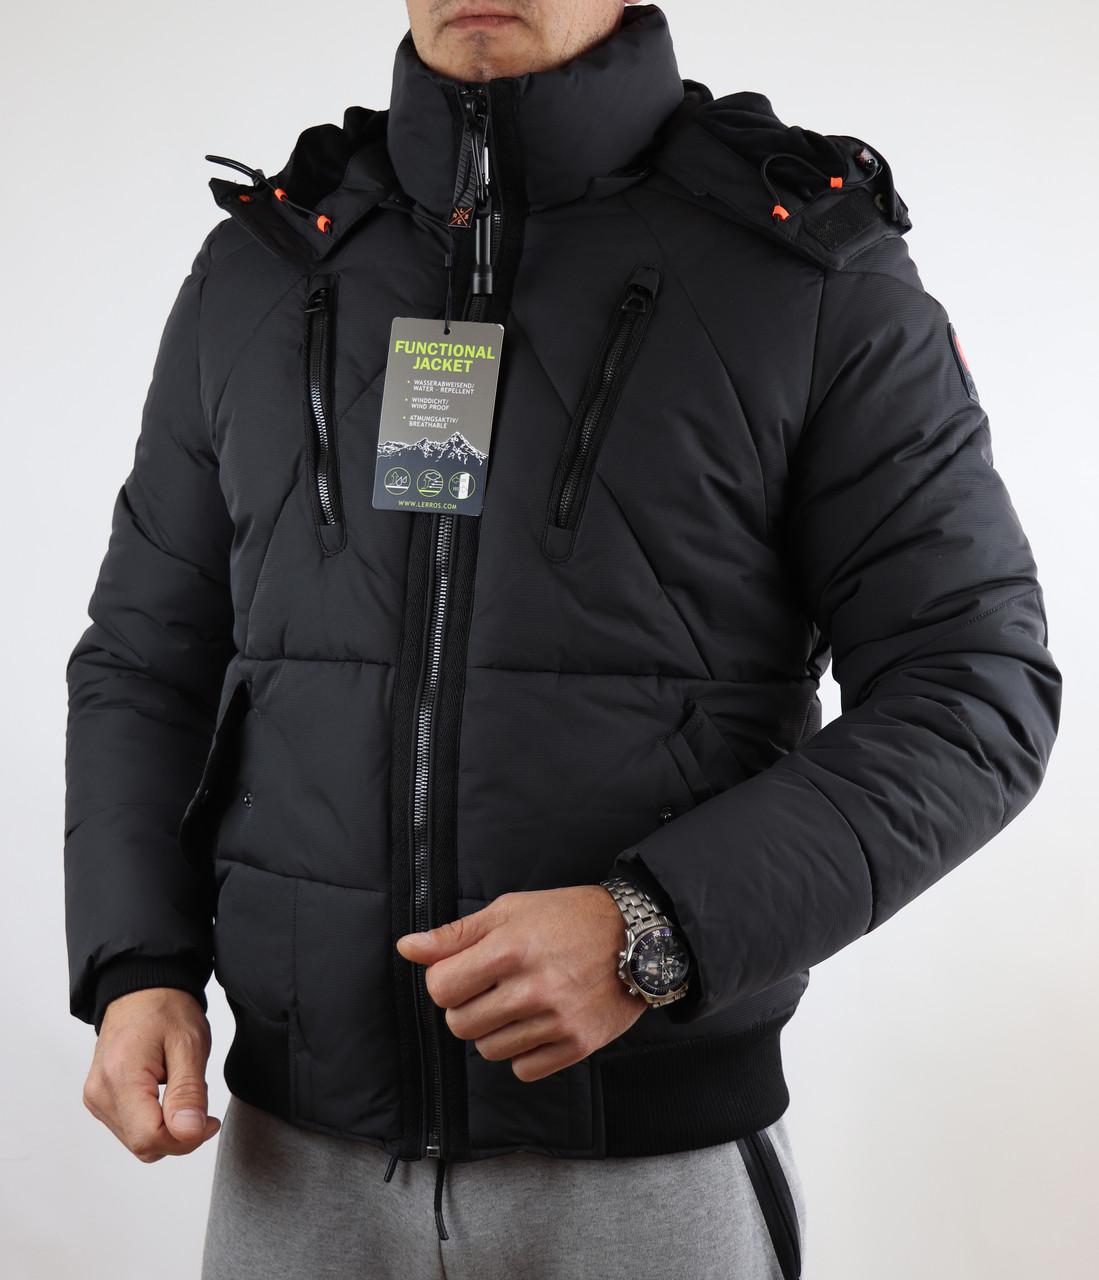 Brand, Куртка муж зима Германия